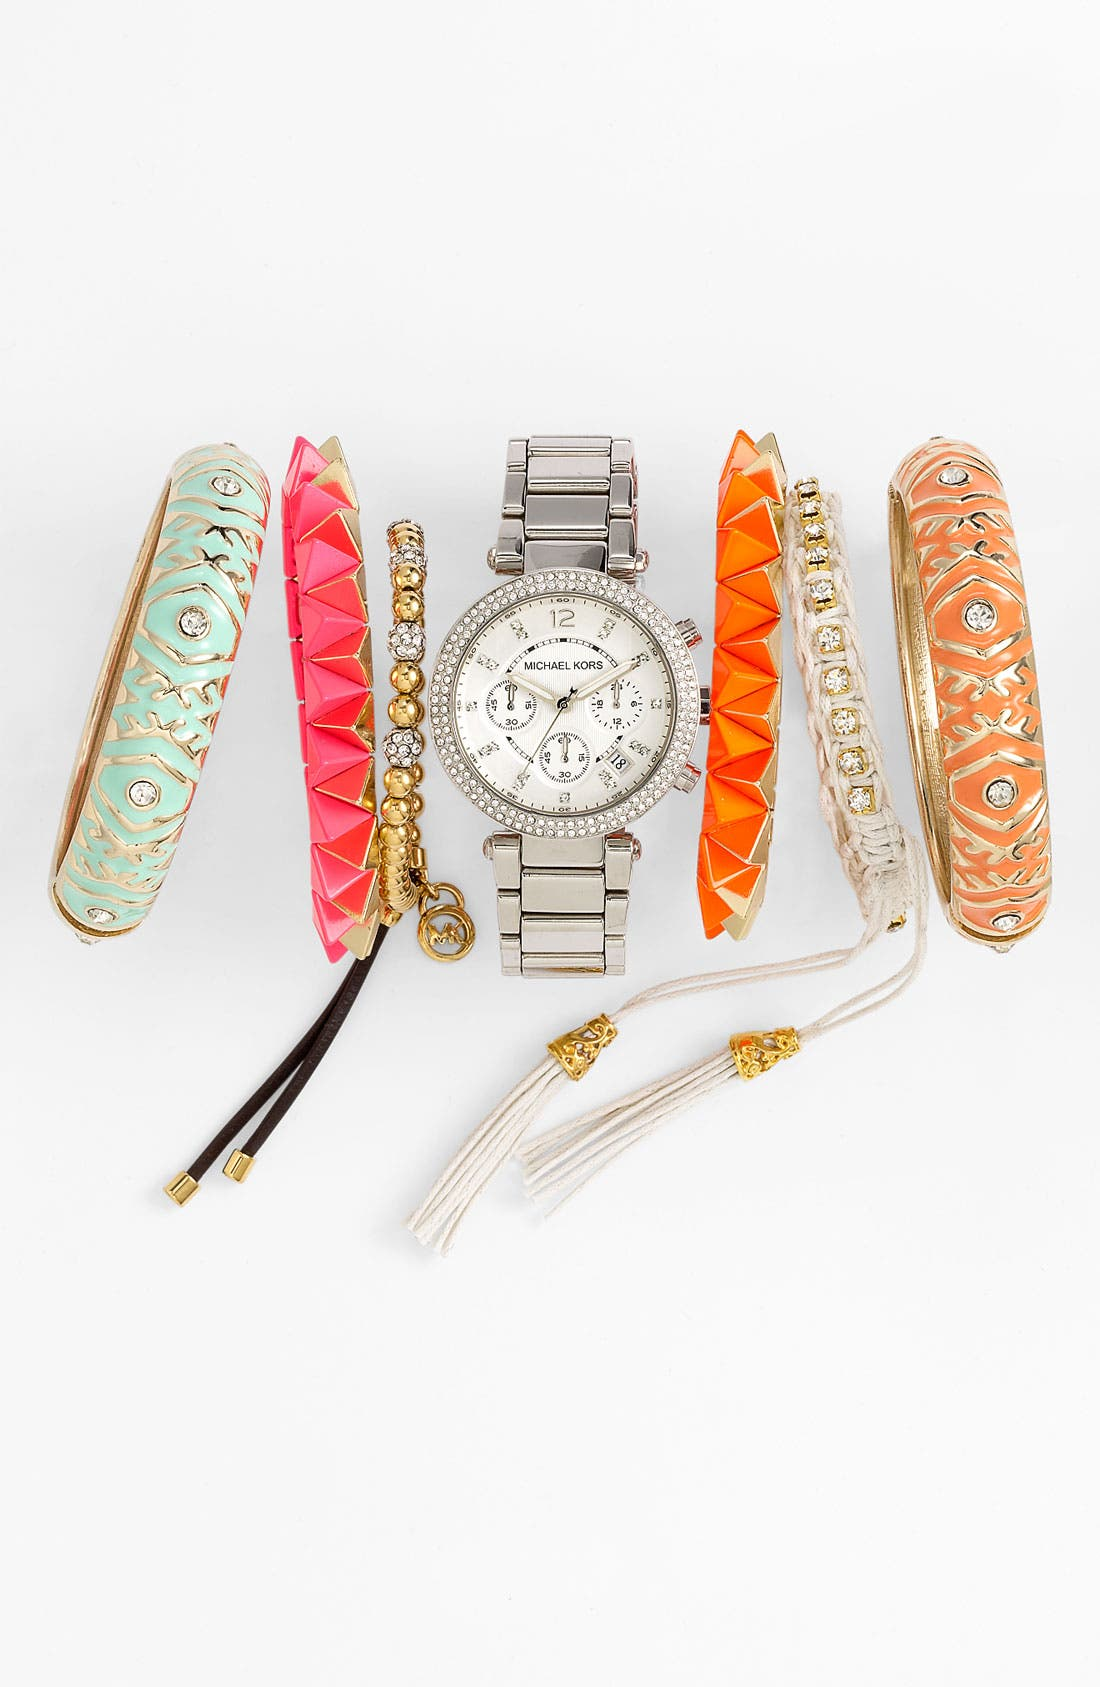 Main Image - Michael Kors Watch & Cara Accessories Bracelets